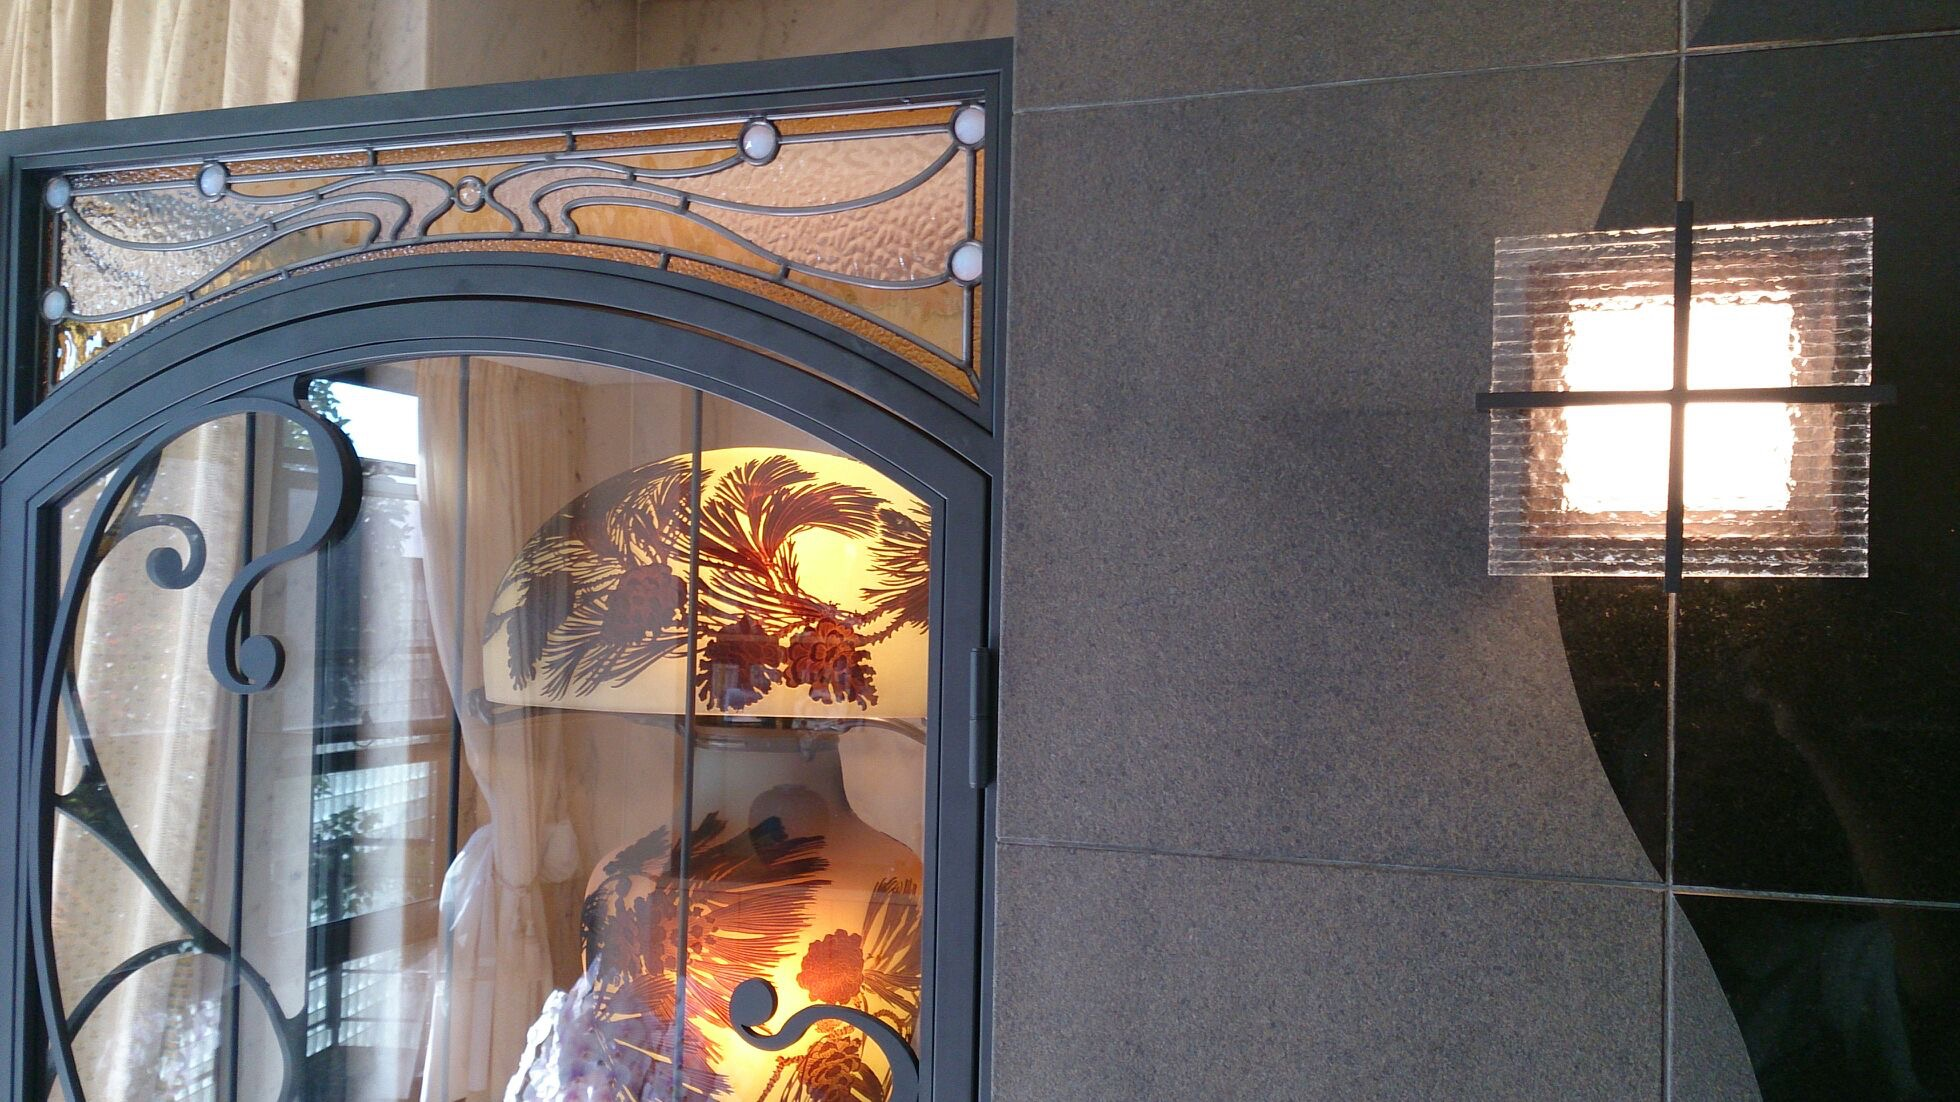 R様邸 ステンド+アイアン飾り棚 壁面照明